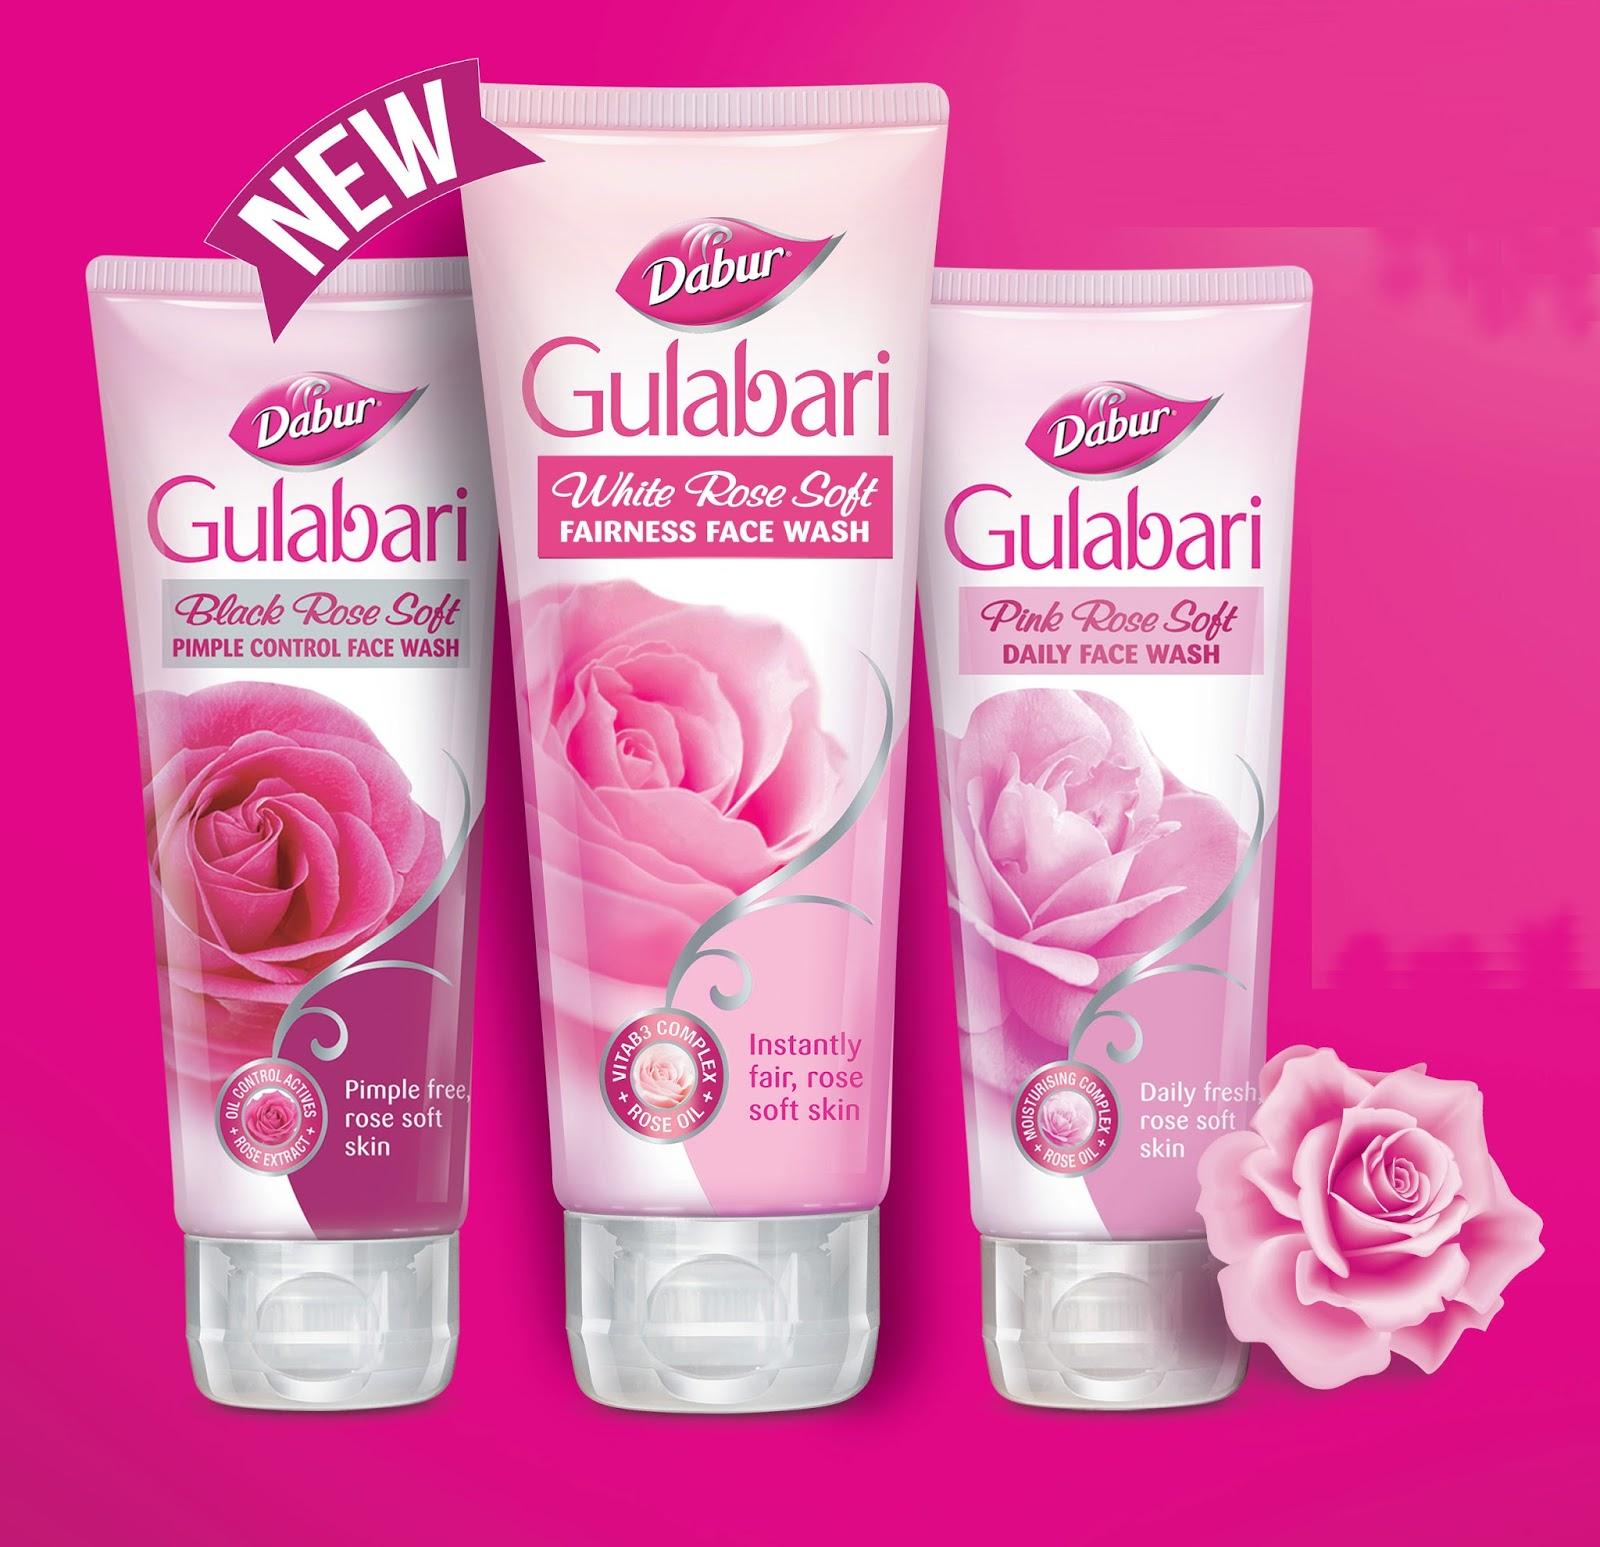 soft skin care